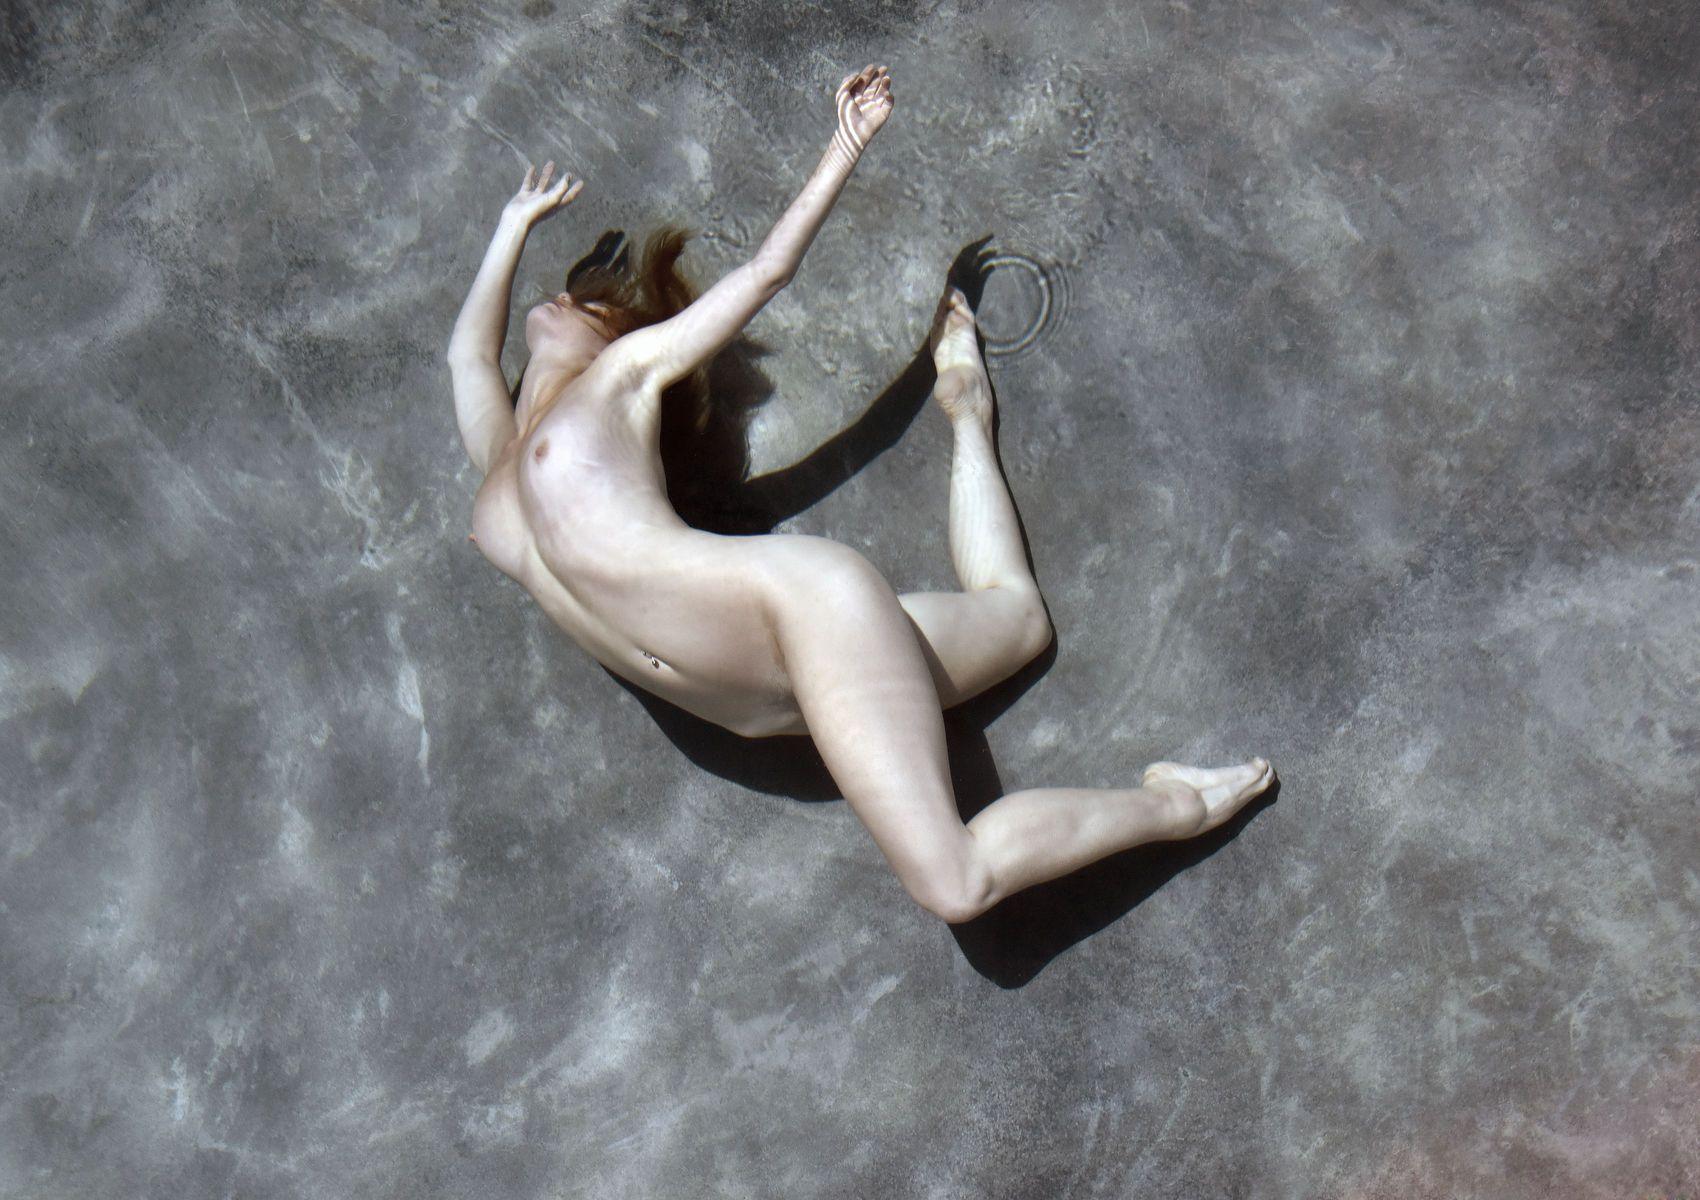 Margot Lena #2, 2015